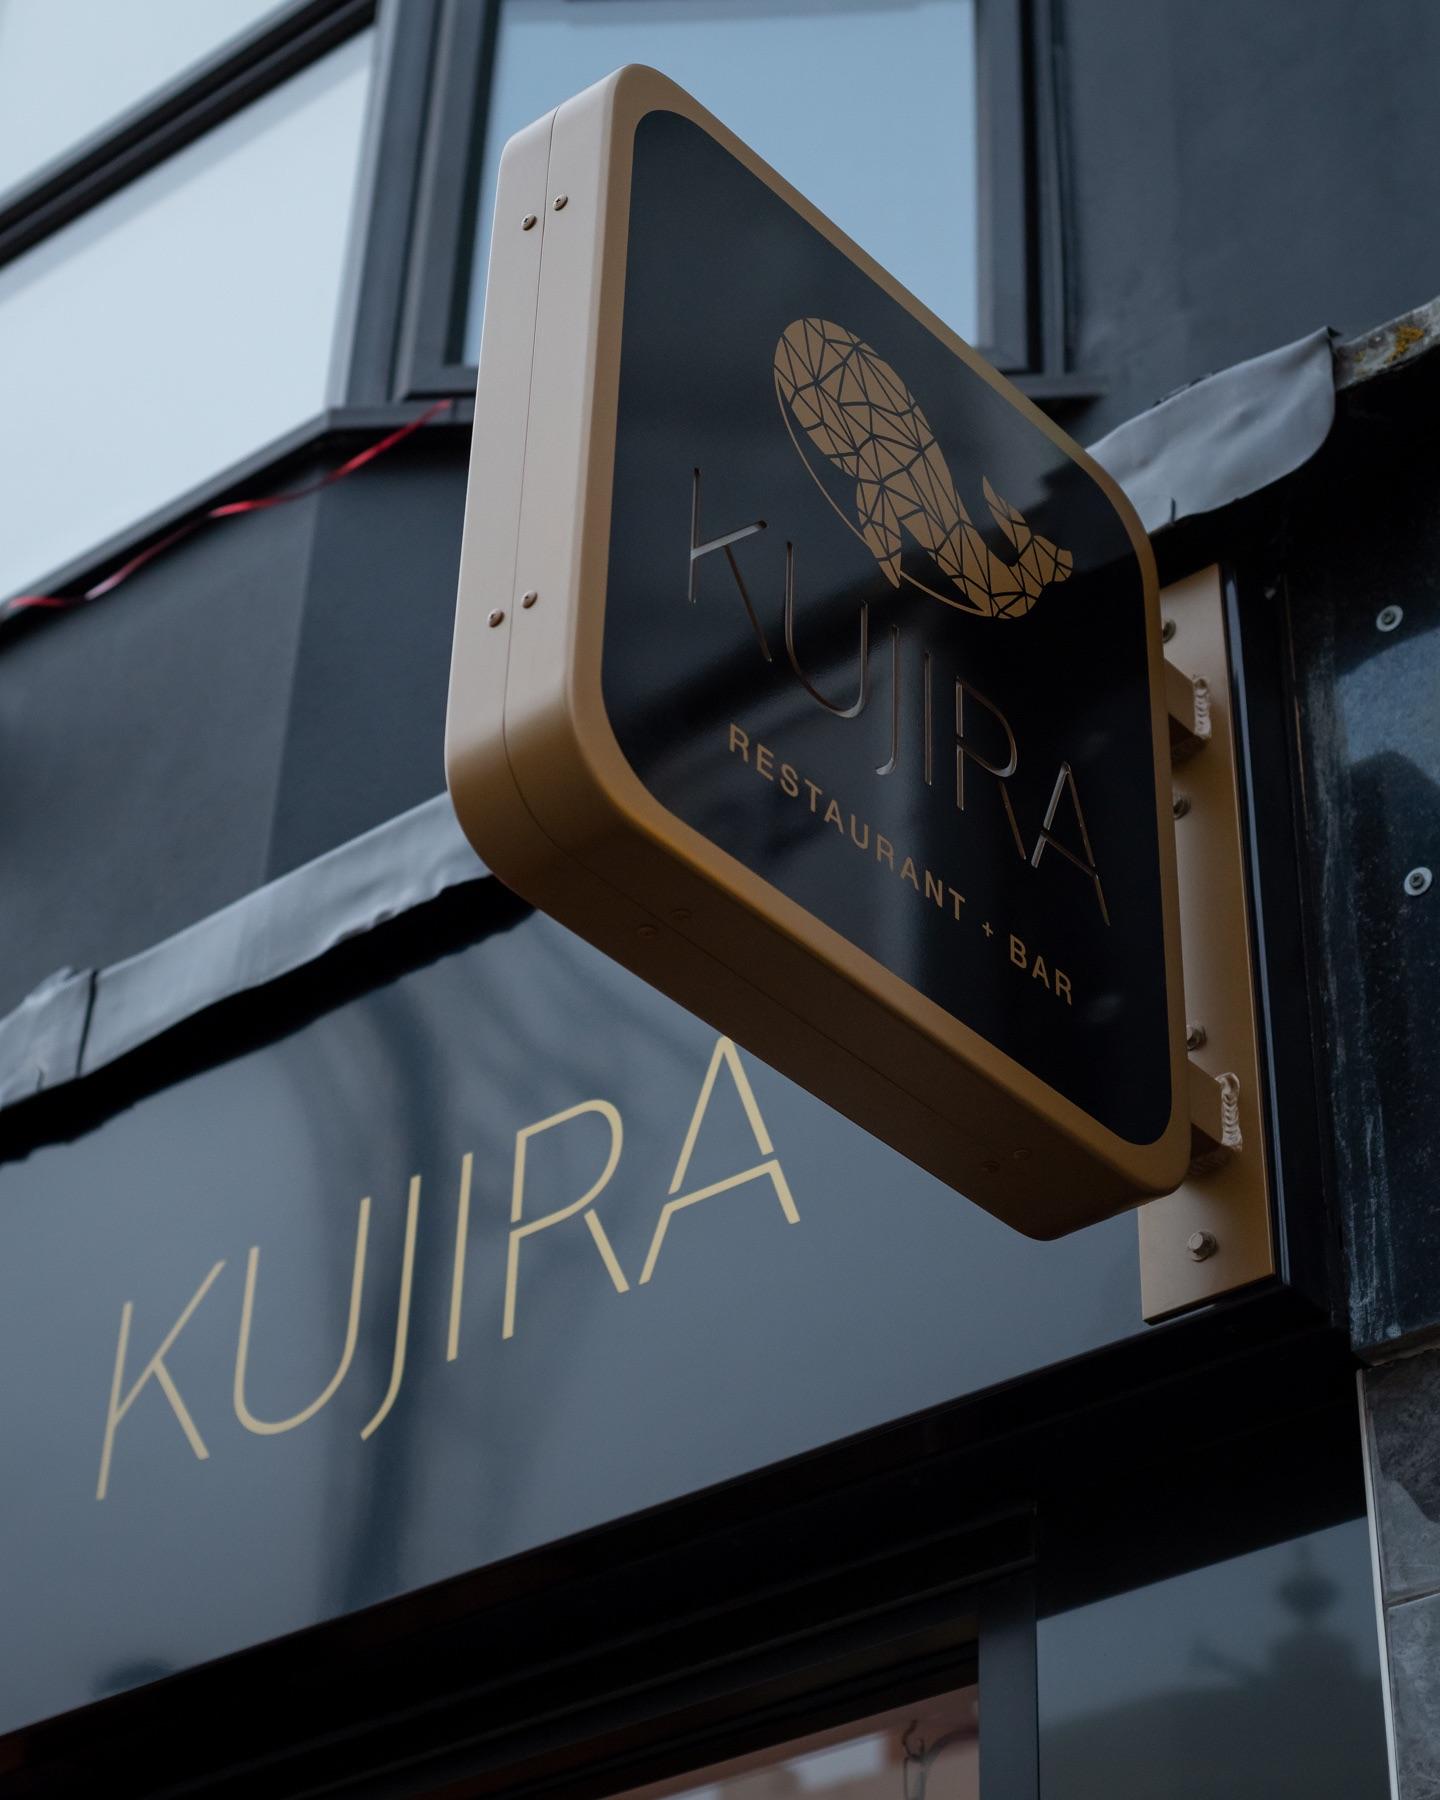 Kujira-JimStephenson-3 WebRes